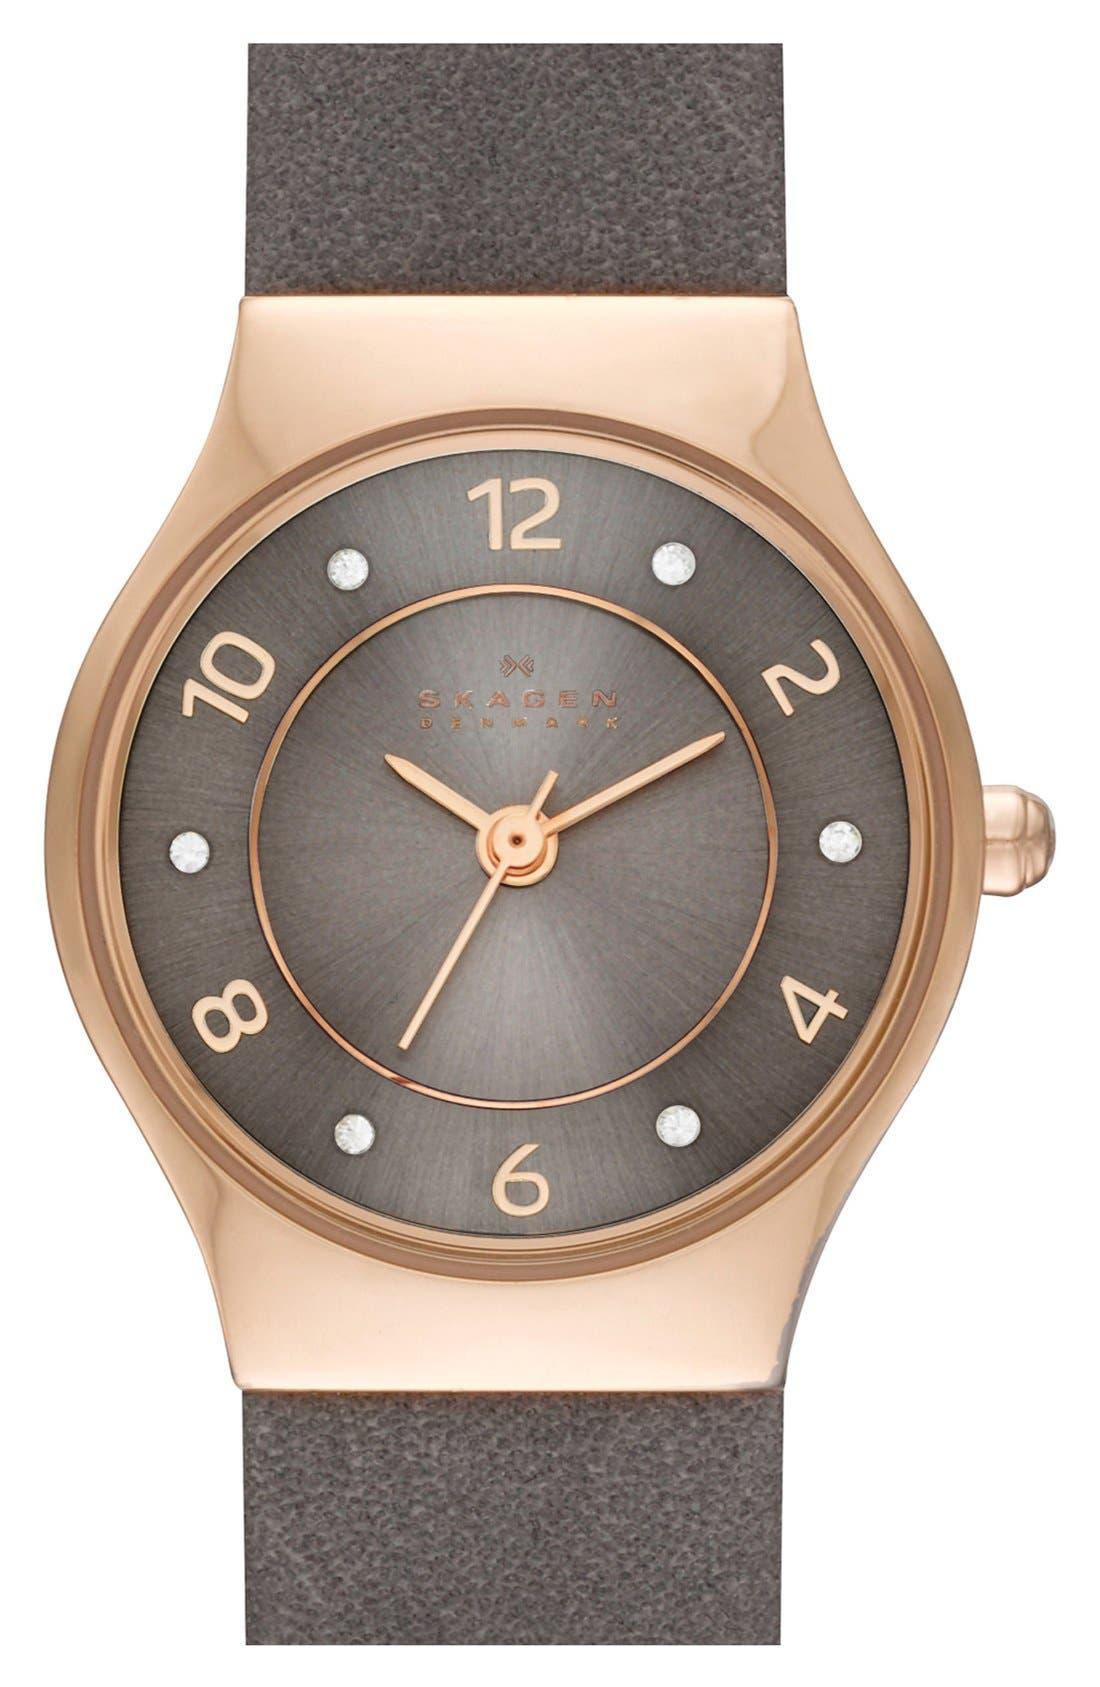 Alternate Image 1 Selected - Skagen 'Grenen' Crystal Marker Leather Strap Watch, 24mm